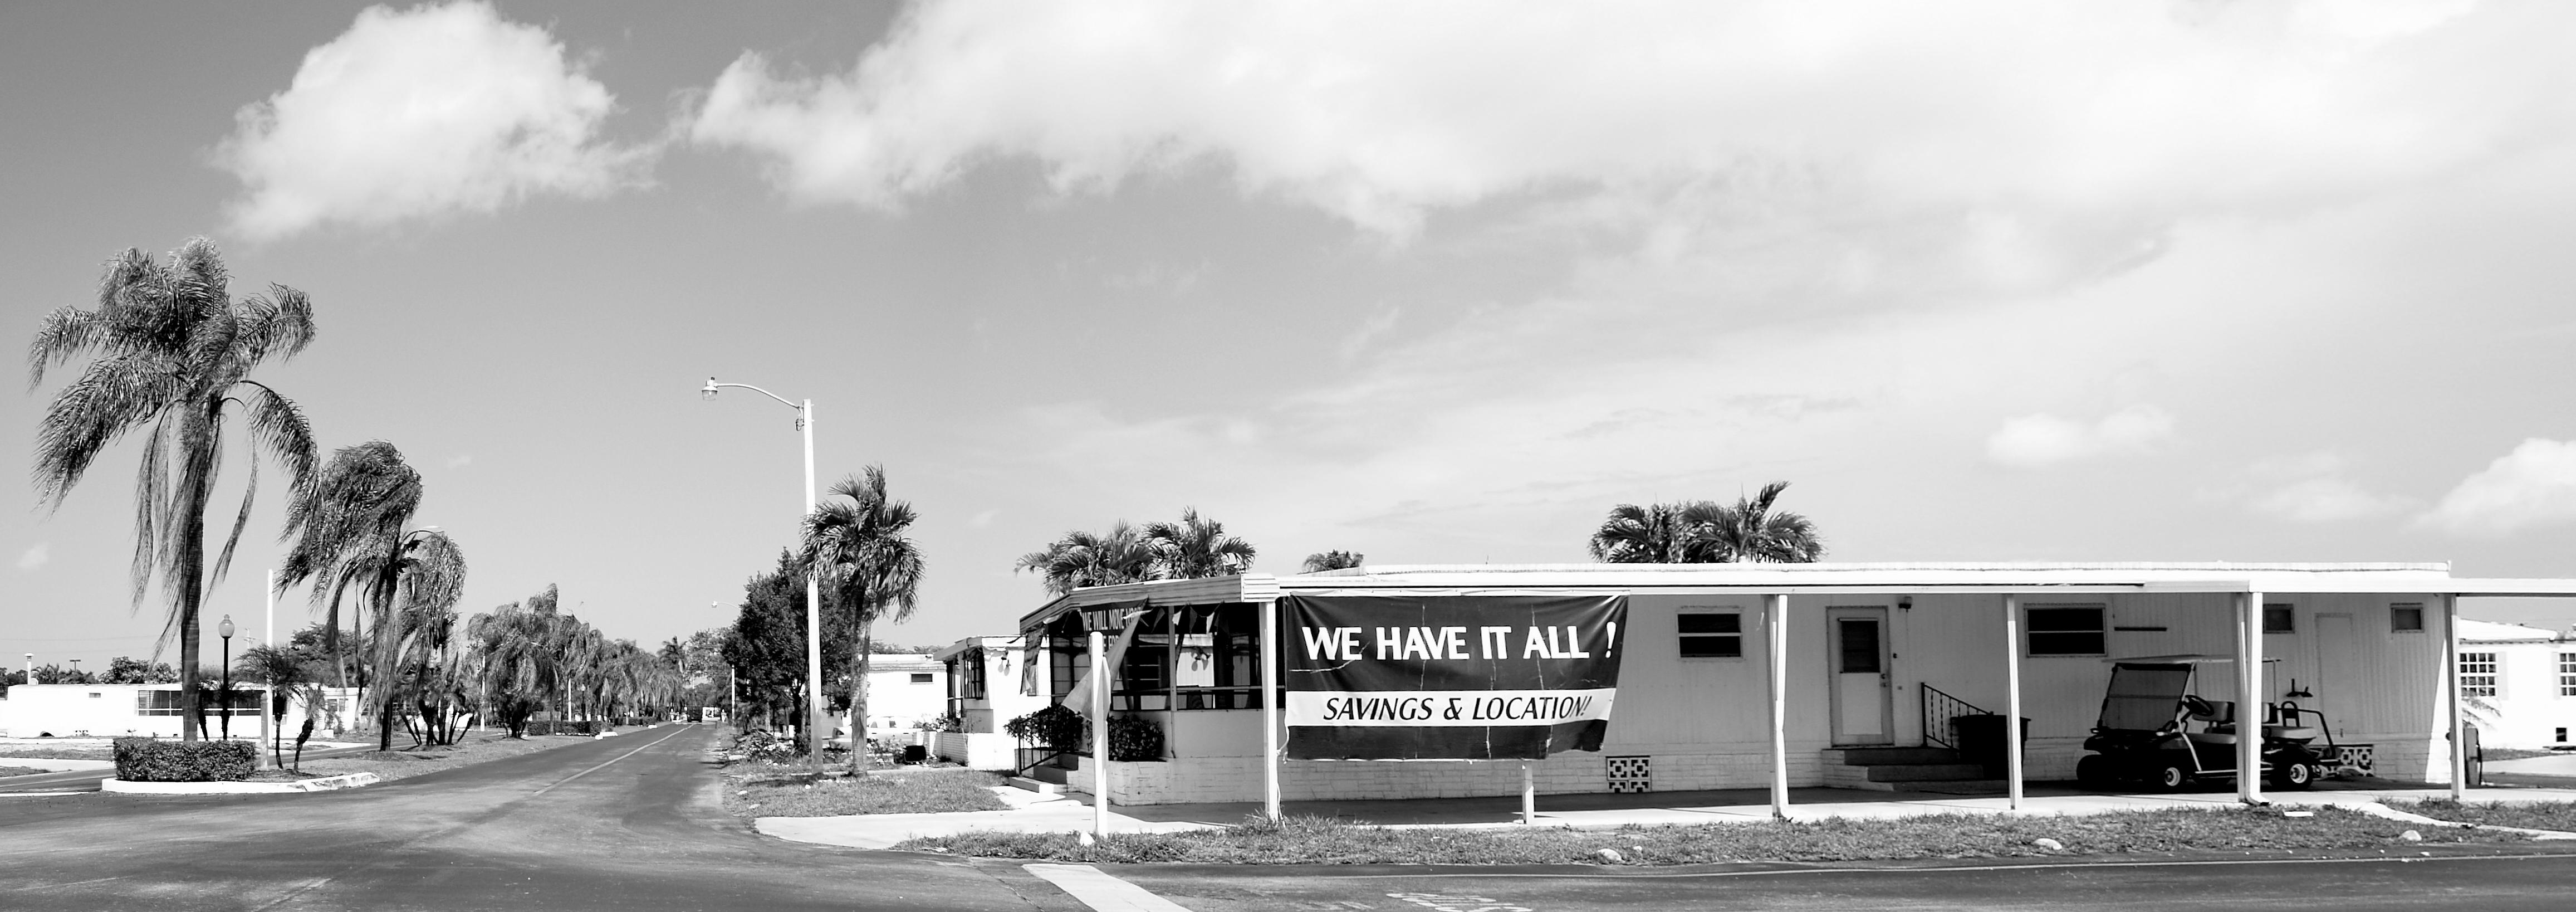 Good Day Sunshine Old Florida Village : Same trailer different park contexts